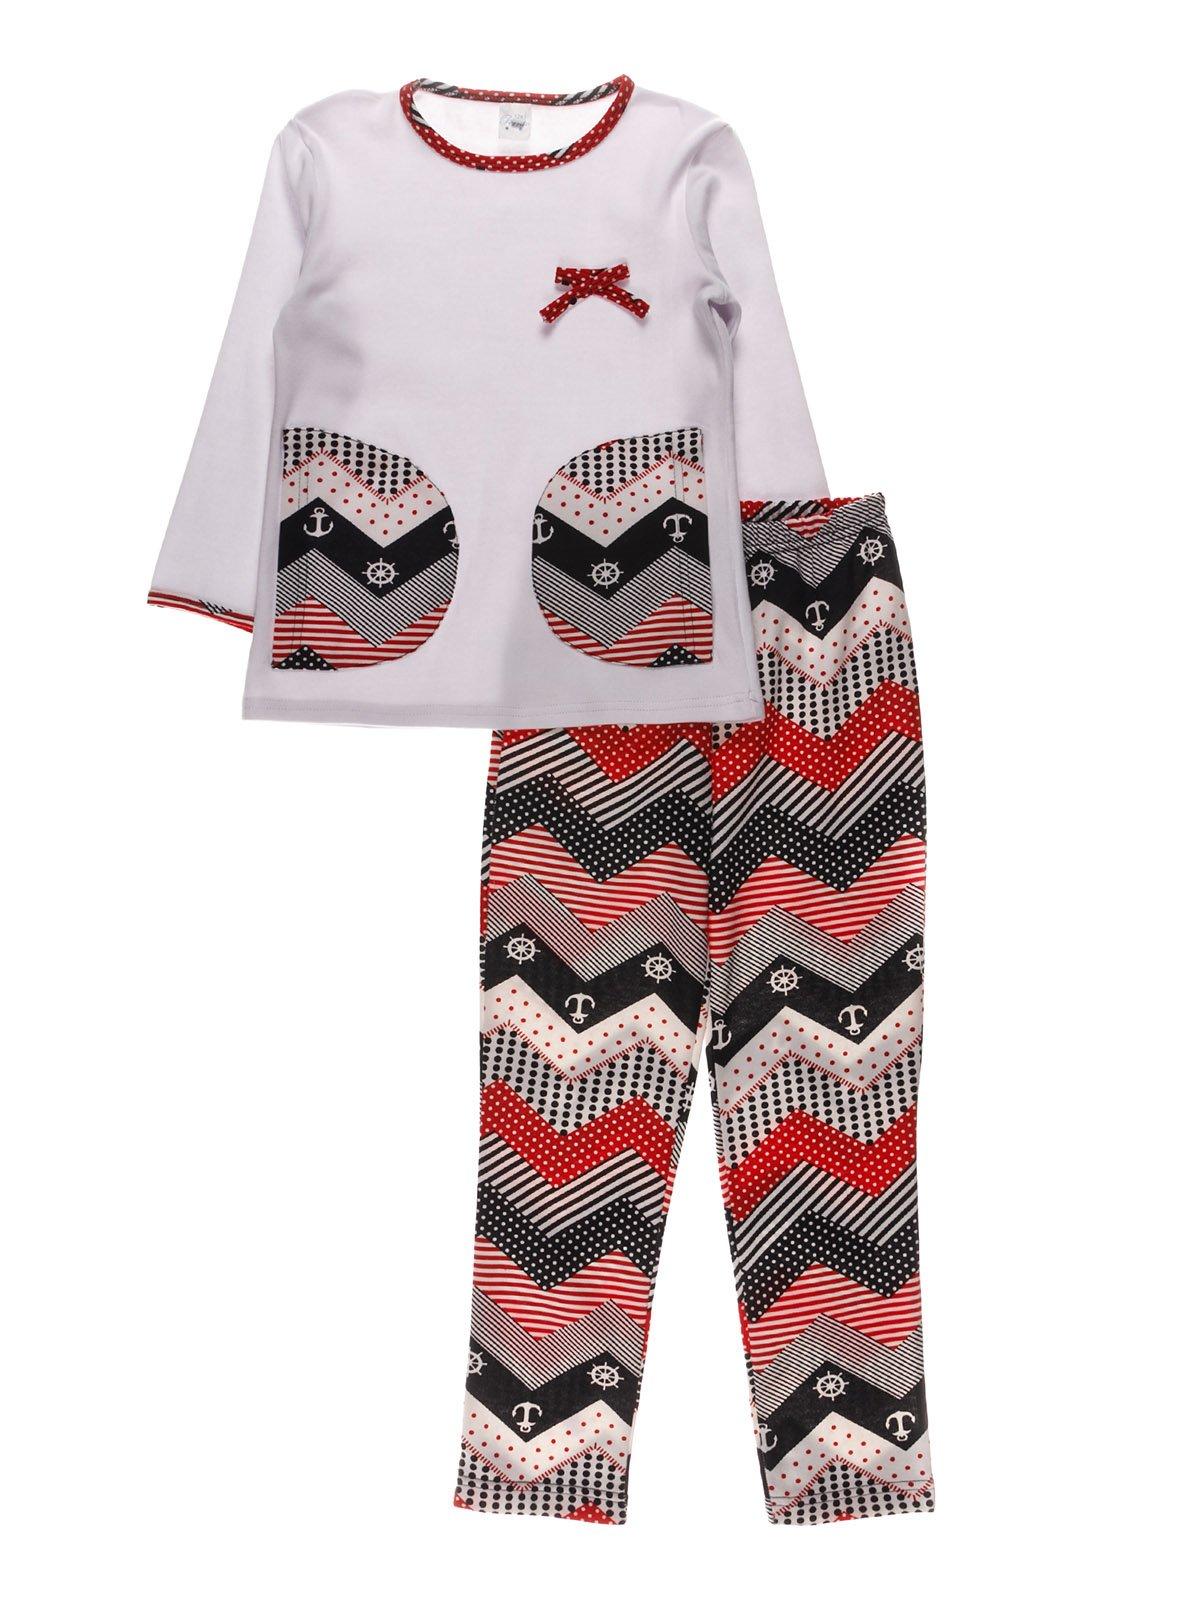 Піжама з начосом: джемпер і штани   3908207